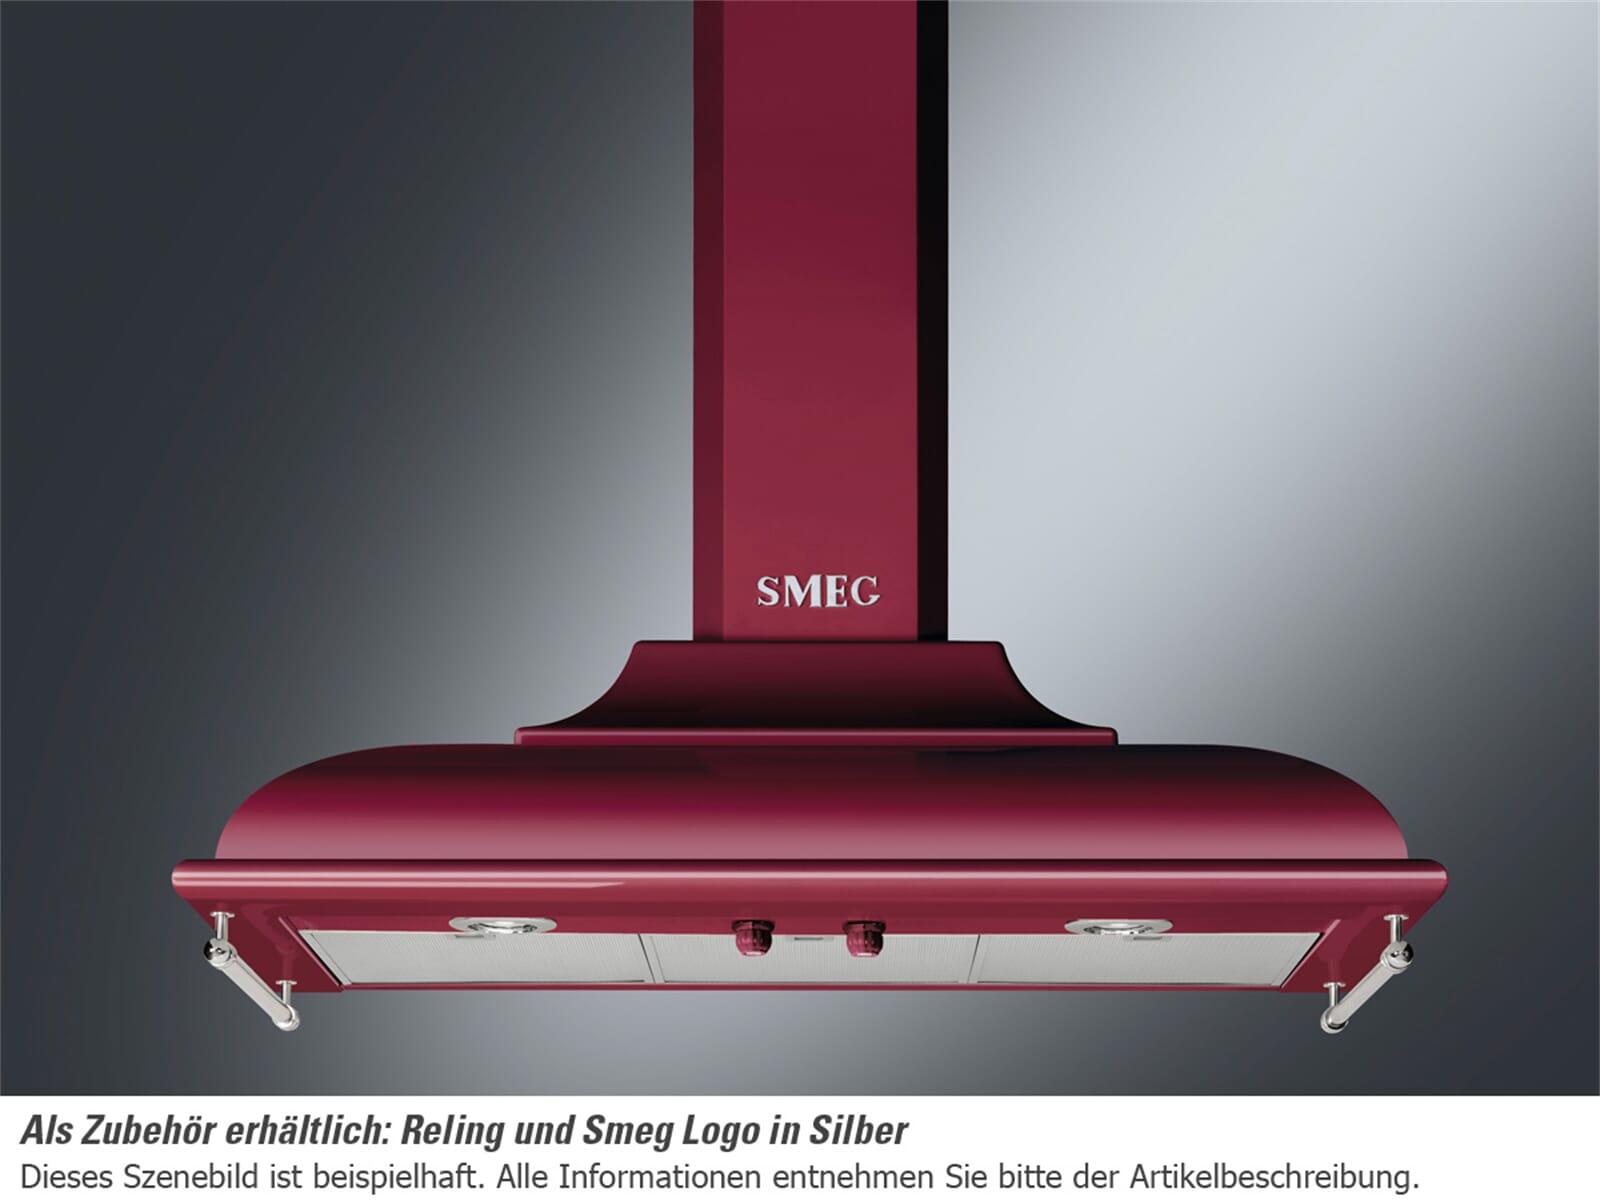 smeg kc19rw wand dunstabzugshaube weinrot f r 1199 00 eur. Black Bedroom Furniture Sets. Home Design Ideas